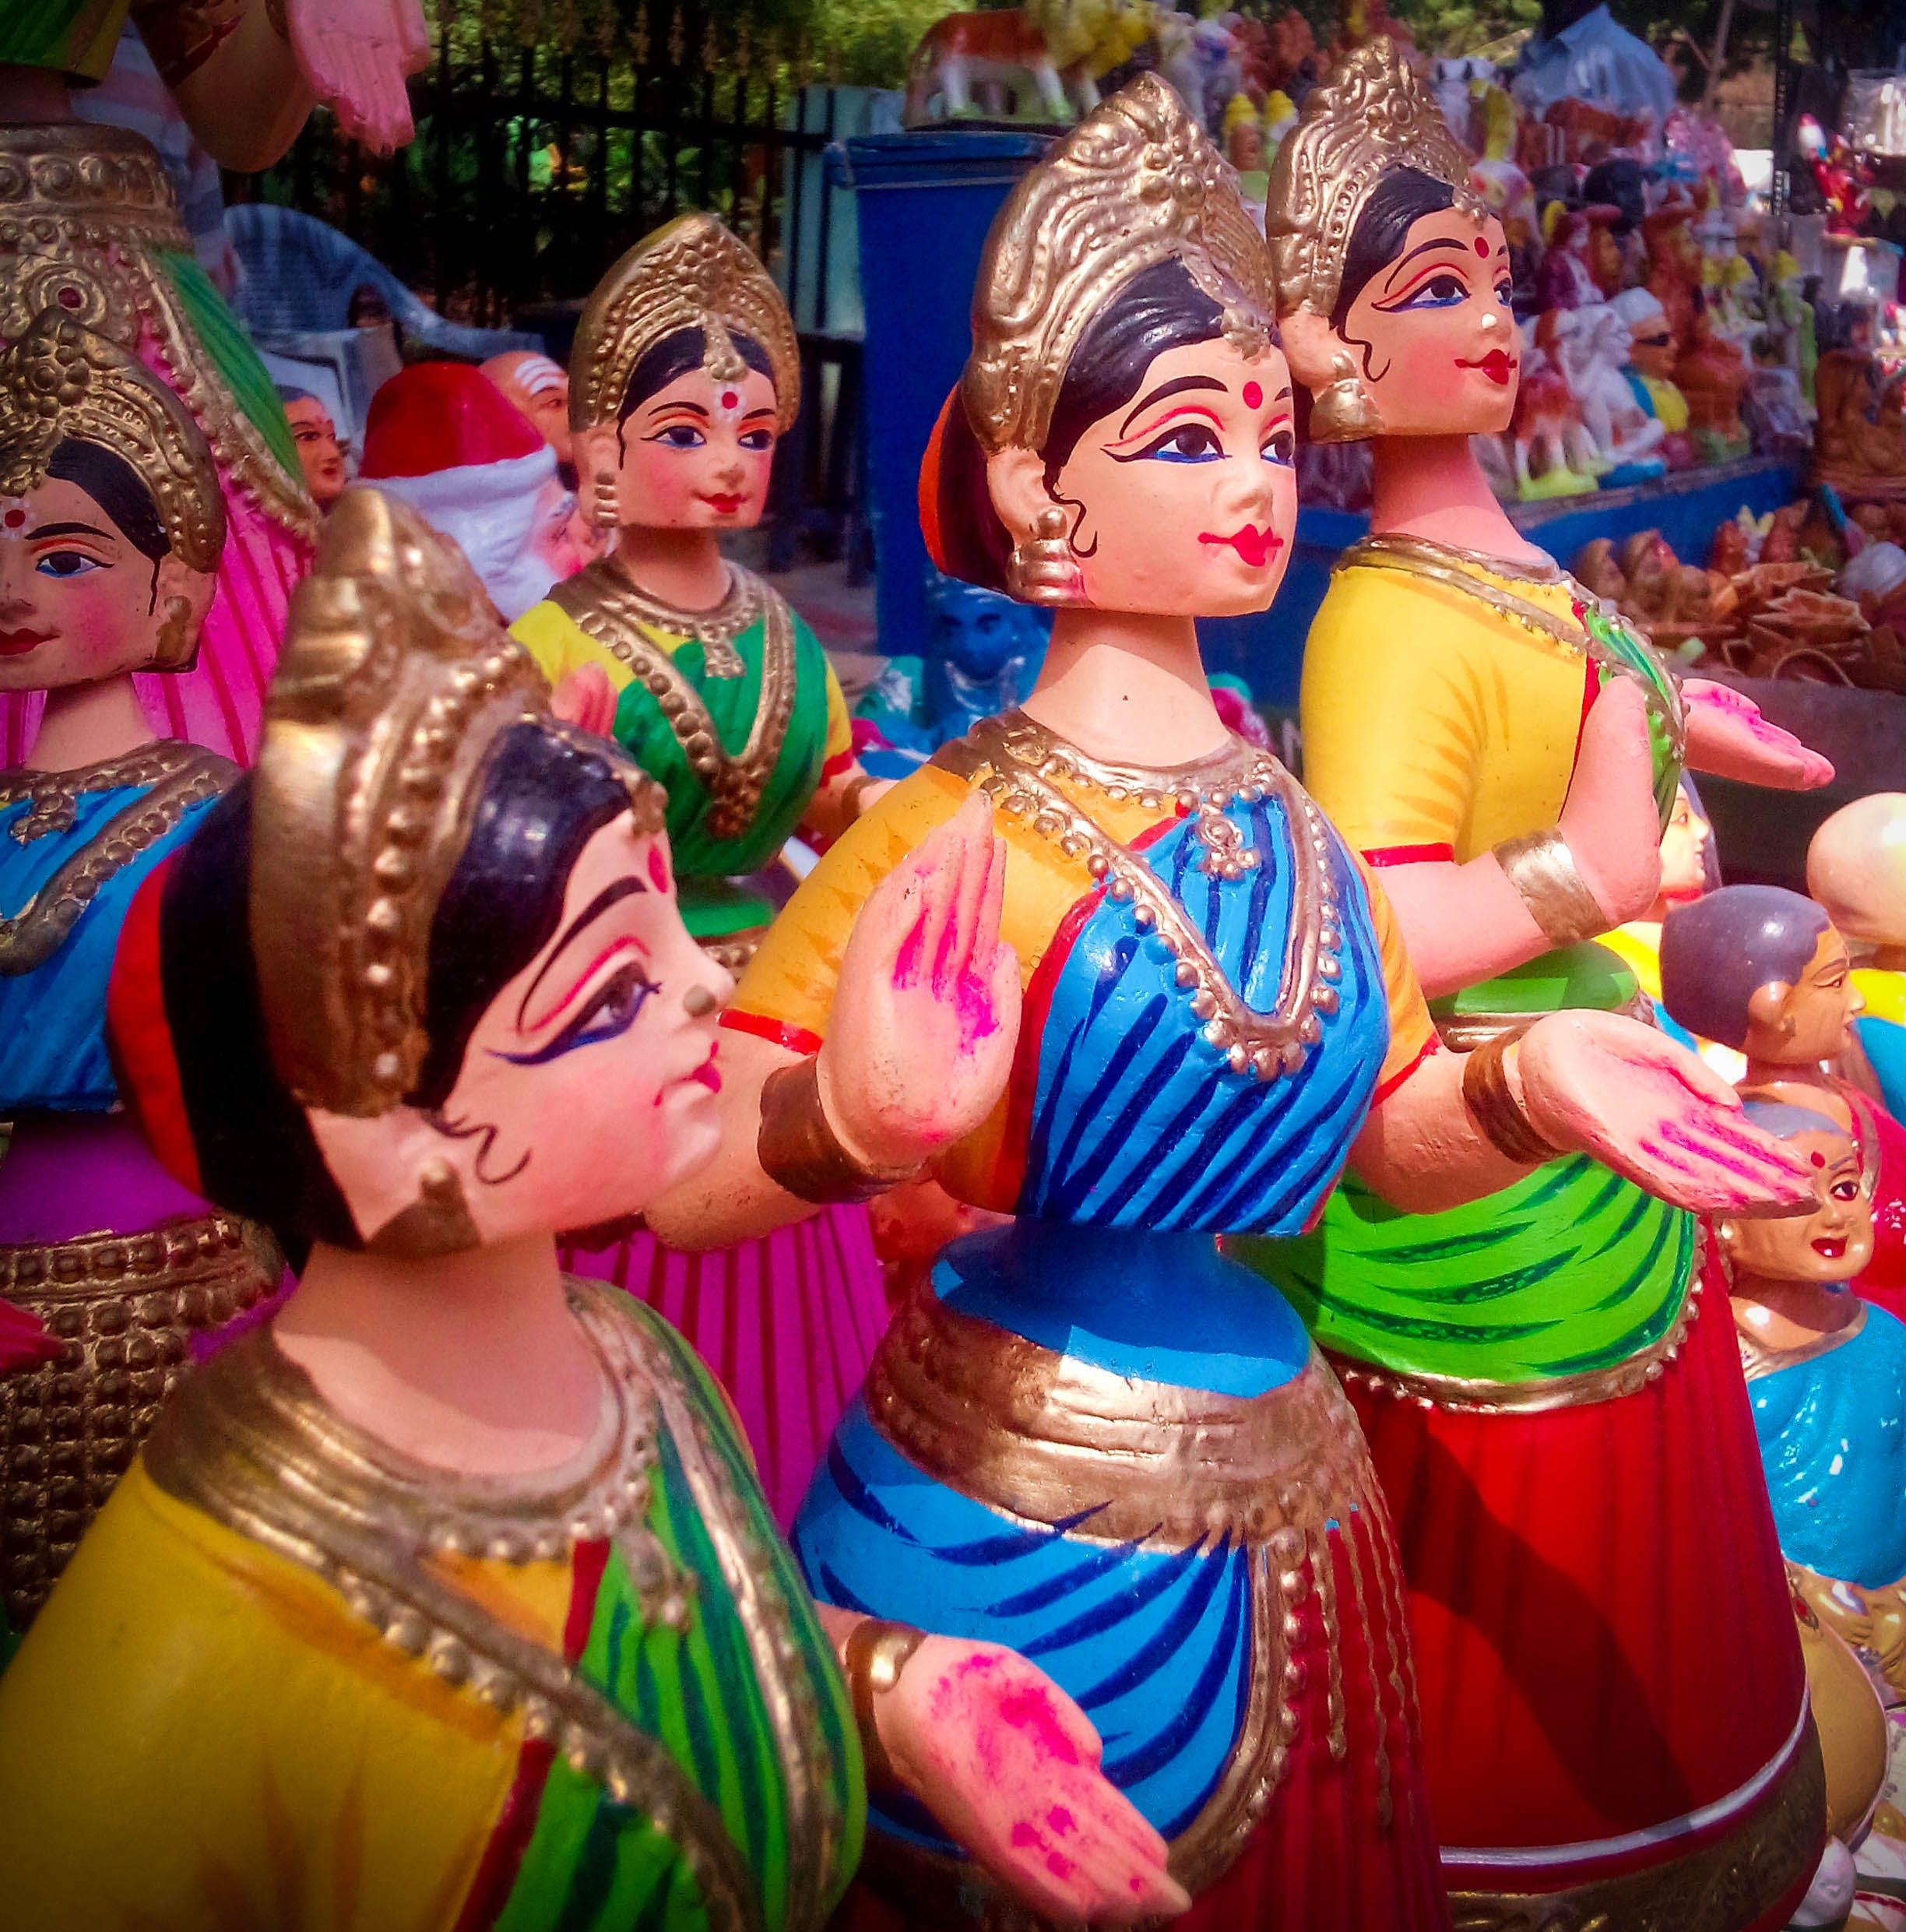 Free stock photo of doll, handmade, thanjavur doll, thanjavur thalaiyaati bommai